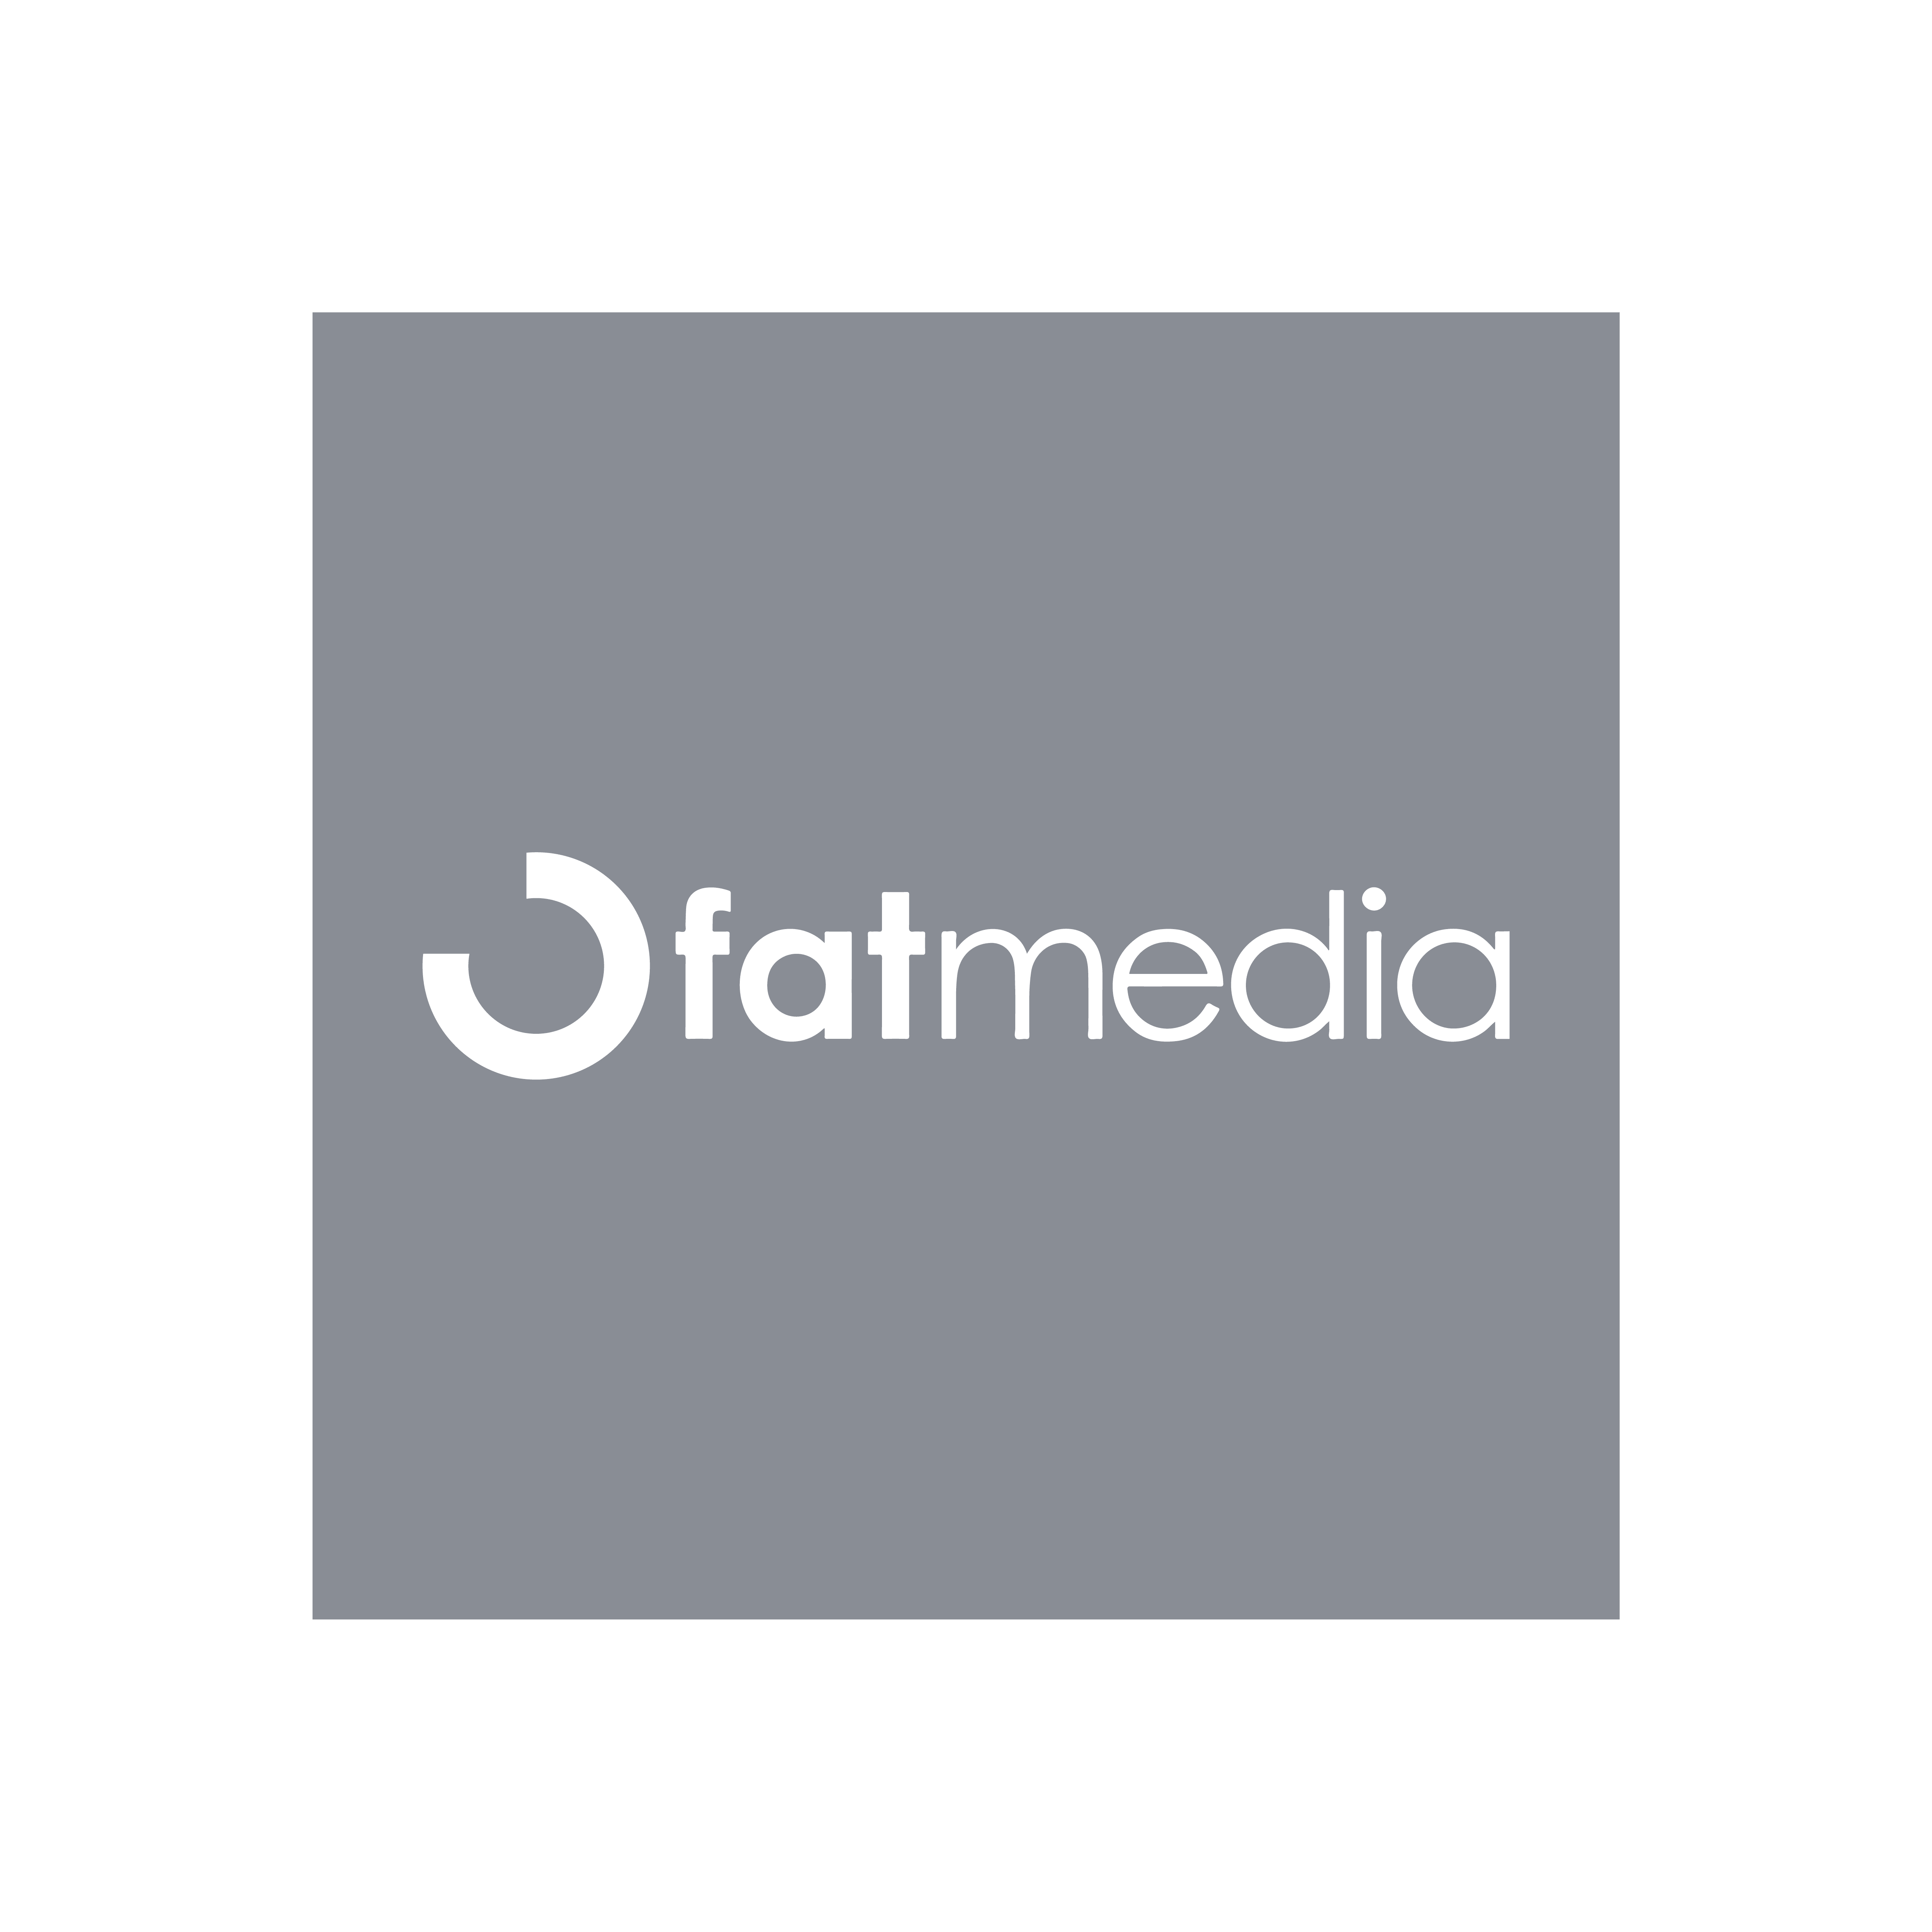 fatmedia-agency